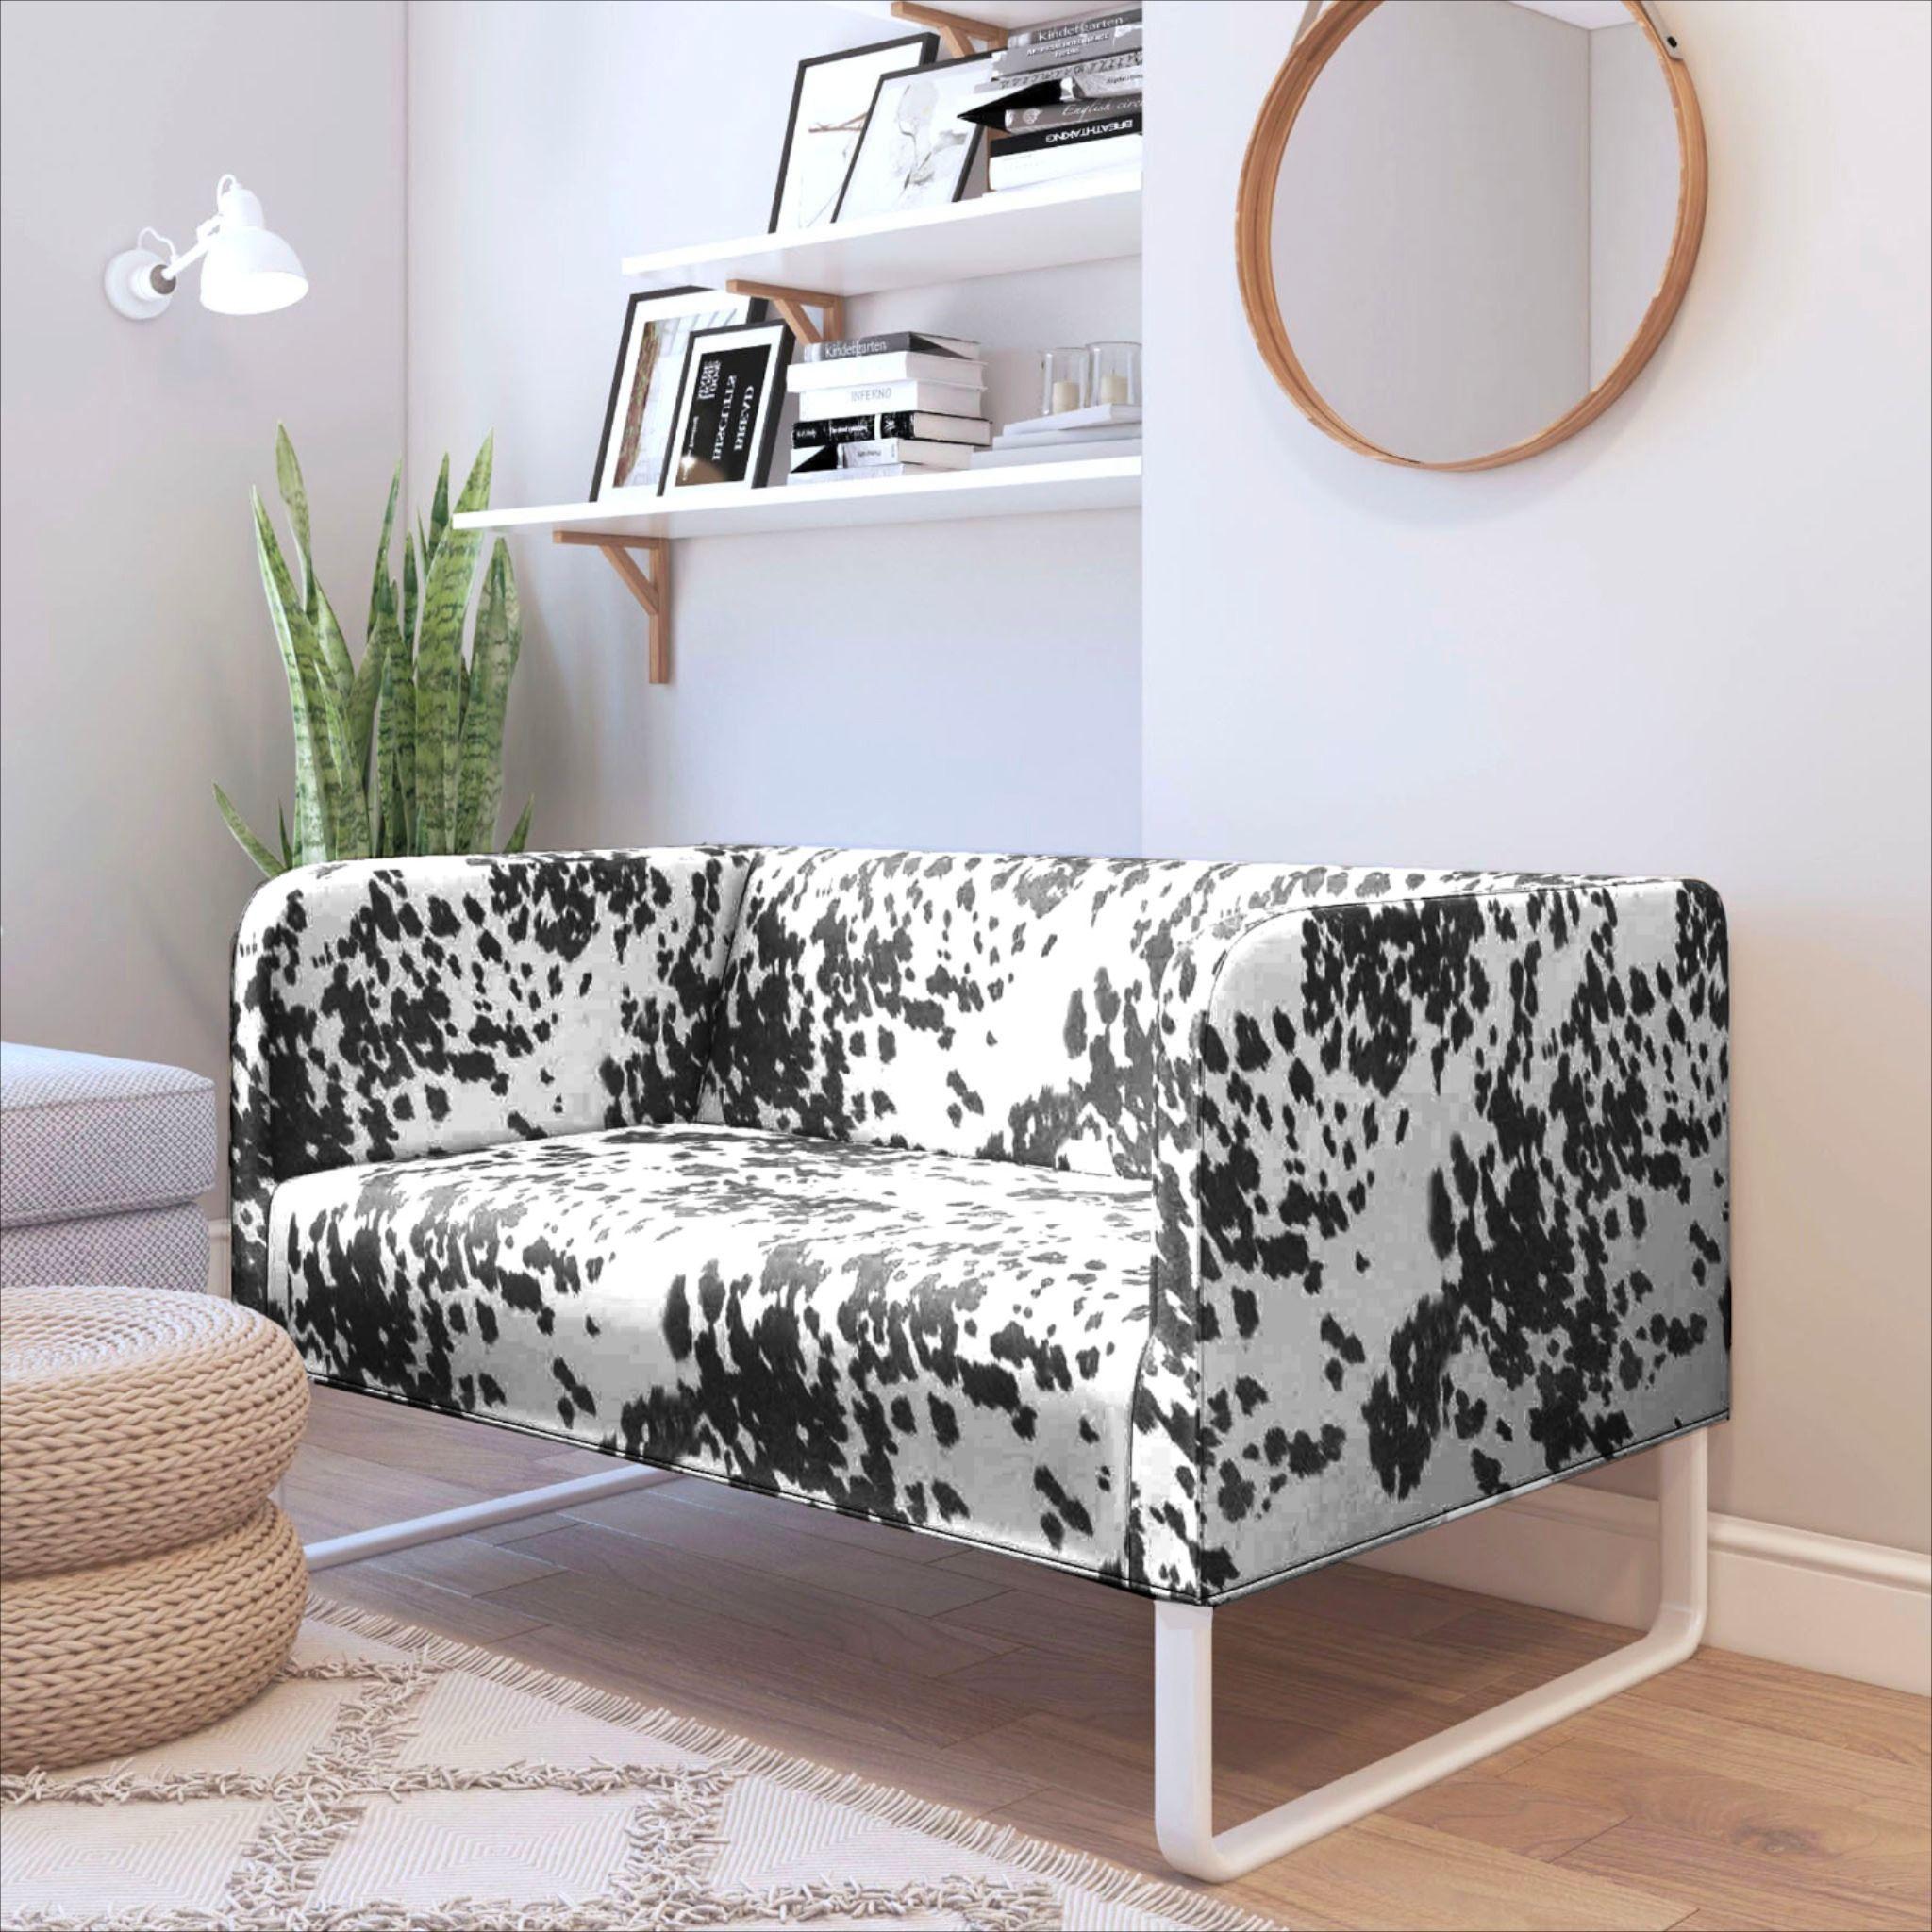 Faux cow print ikea knopparp sofa cover black living